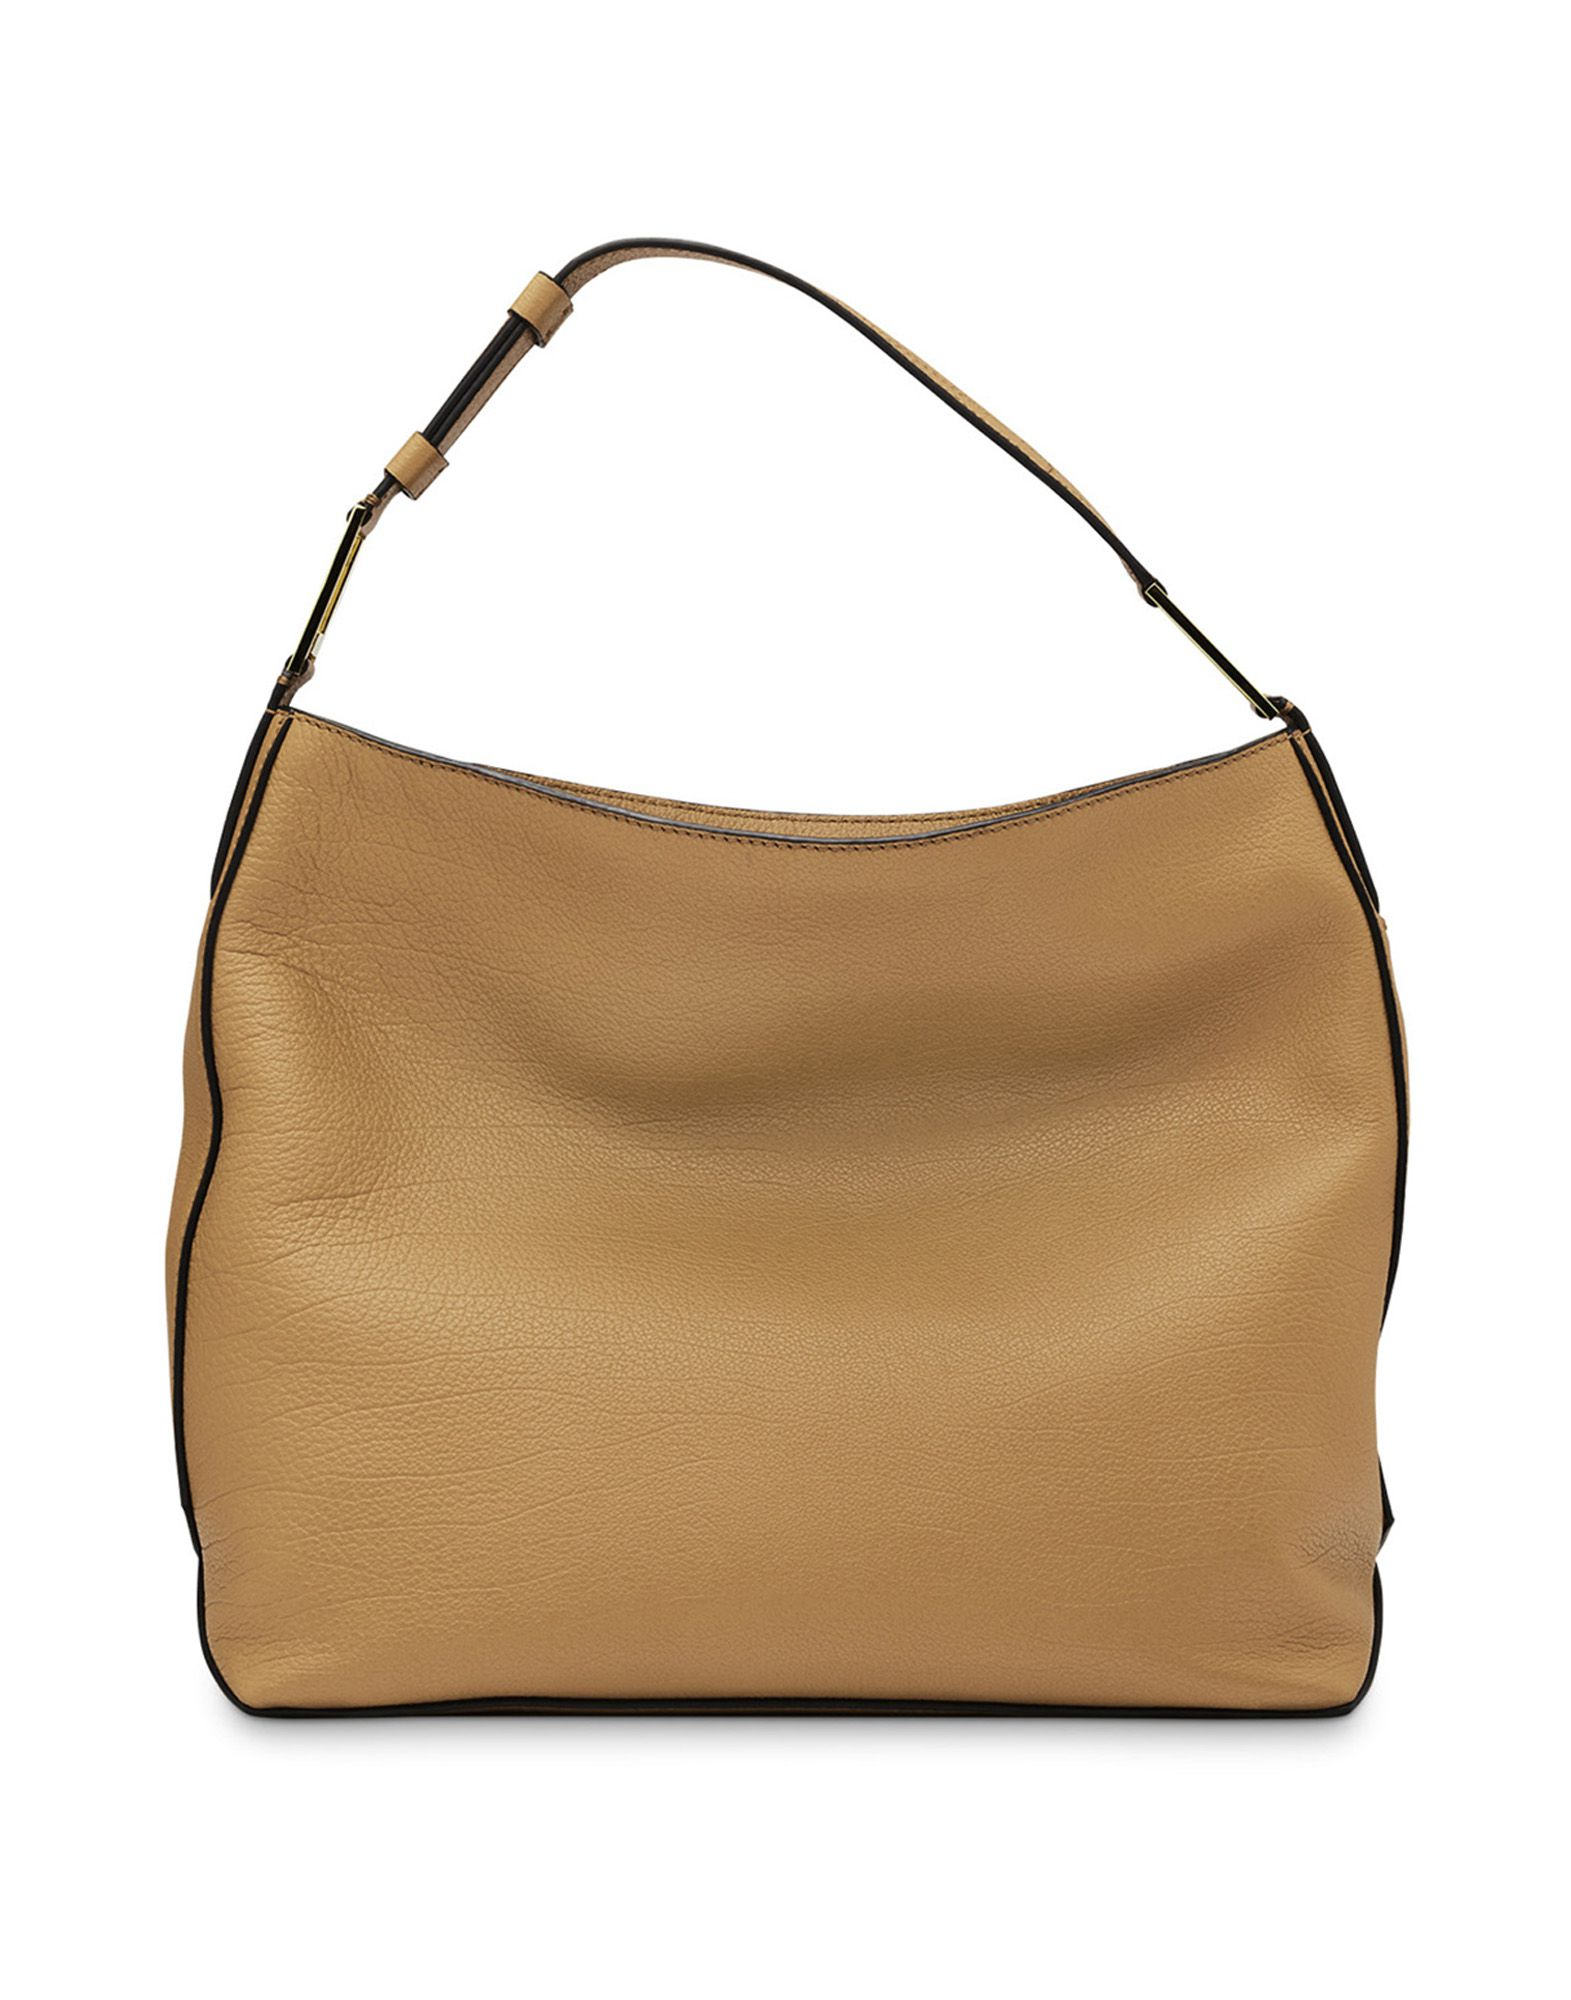 7869aab0a0 Lancel Max De Lancel - Handbag - Women Lancel Handbags online on ...